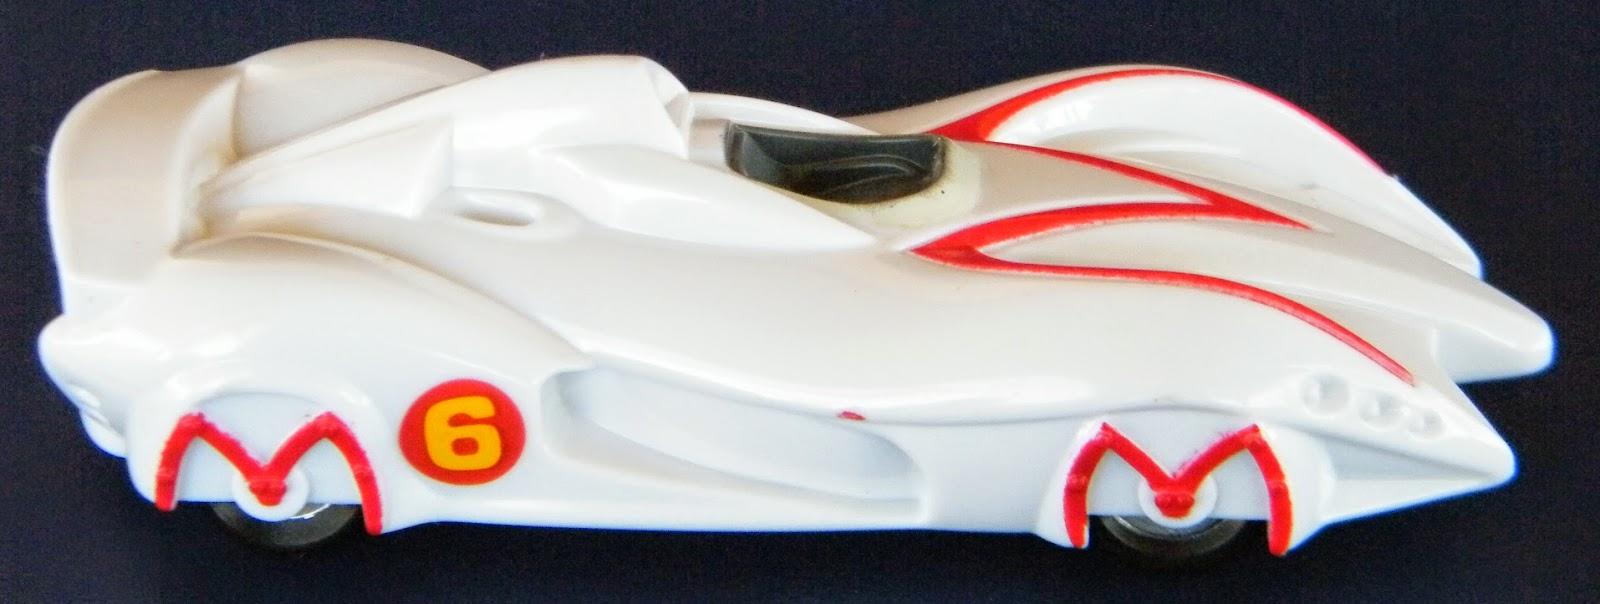 Speed Racer Mach 3 - Bing images